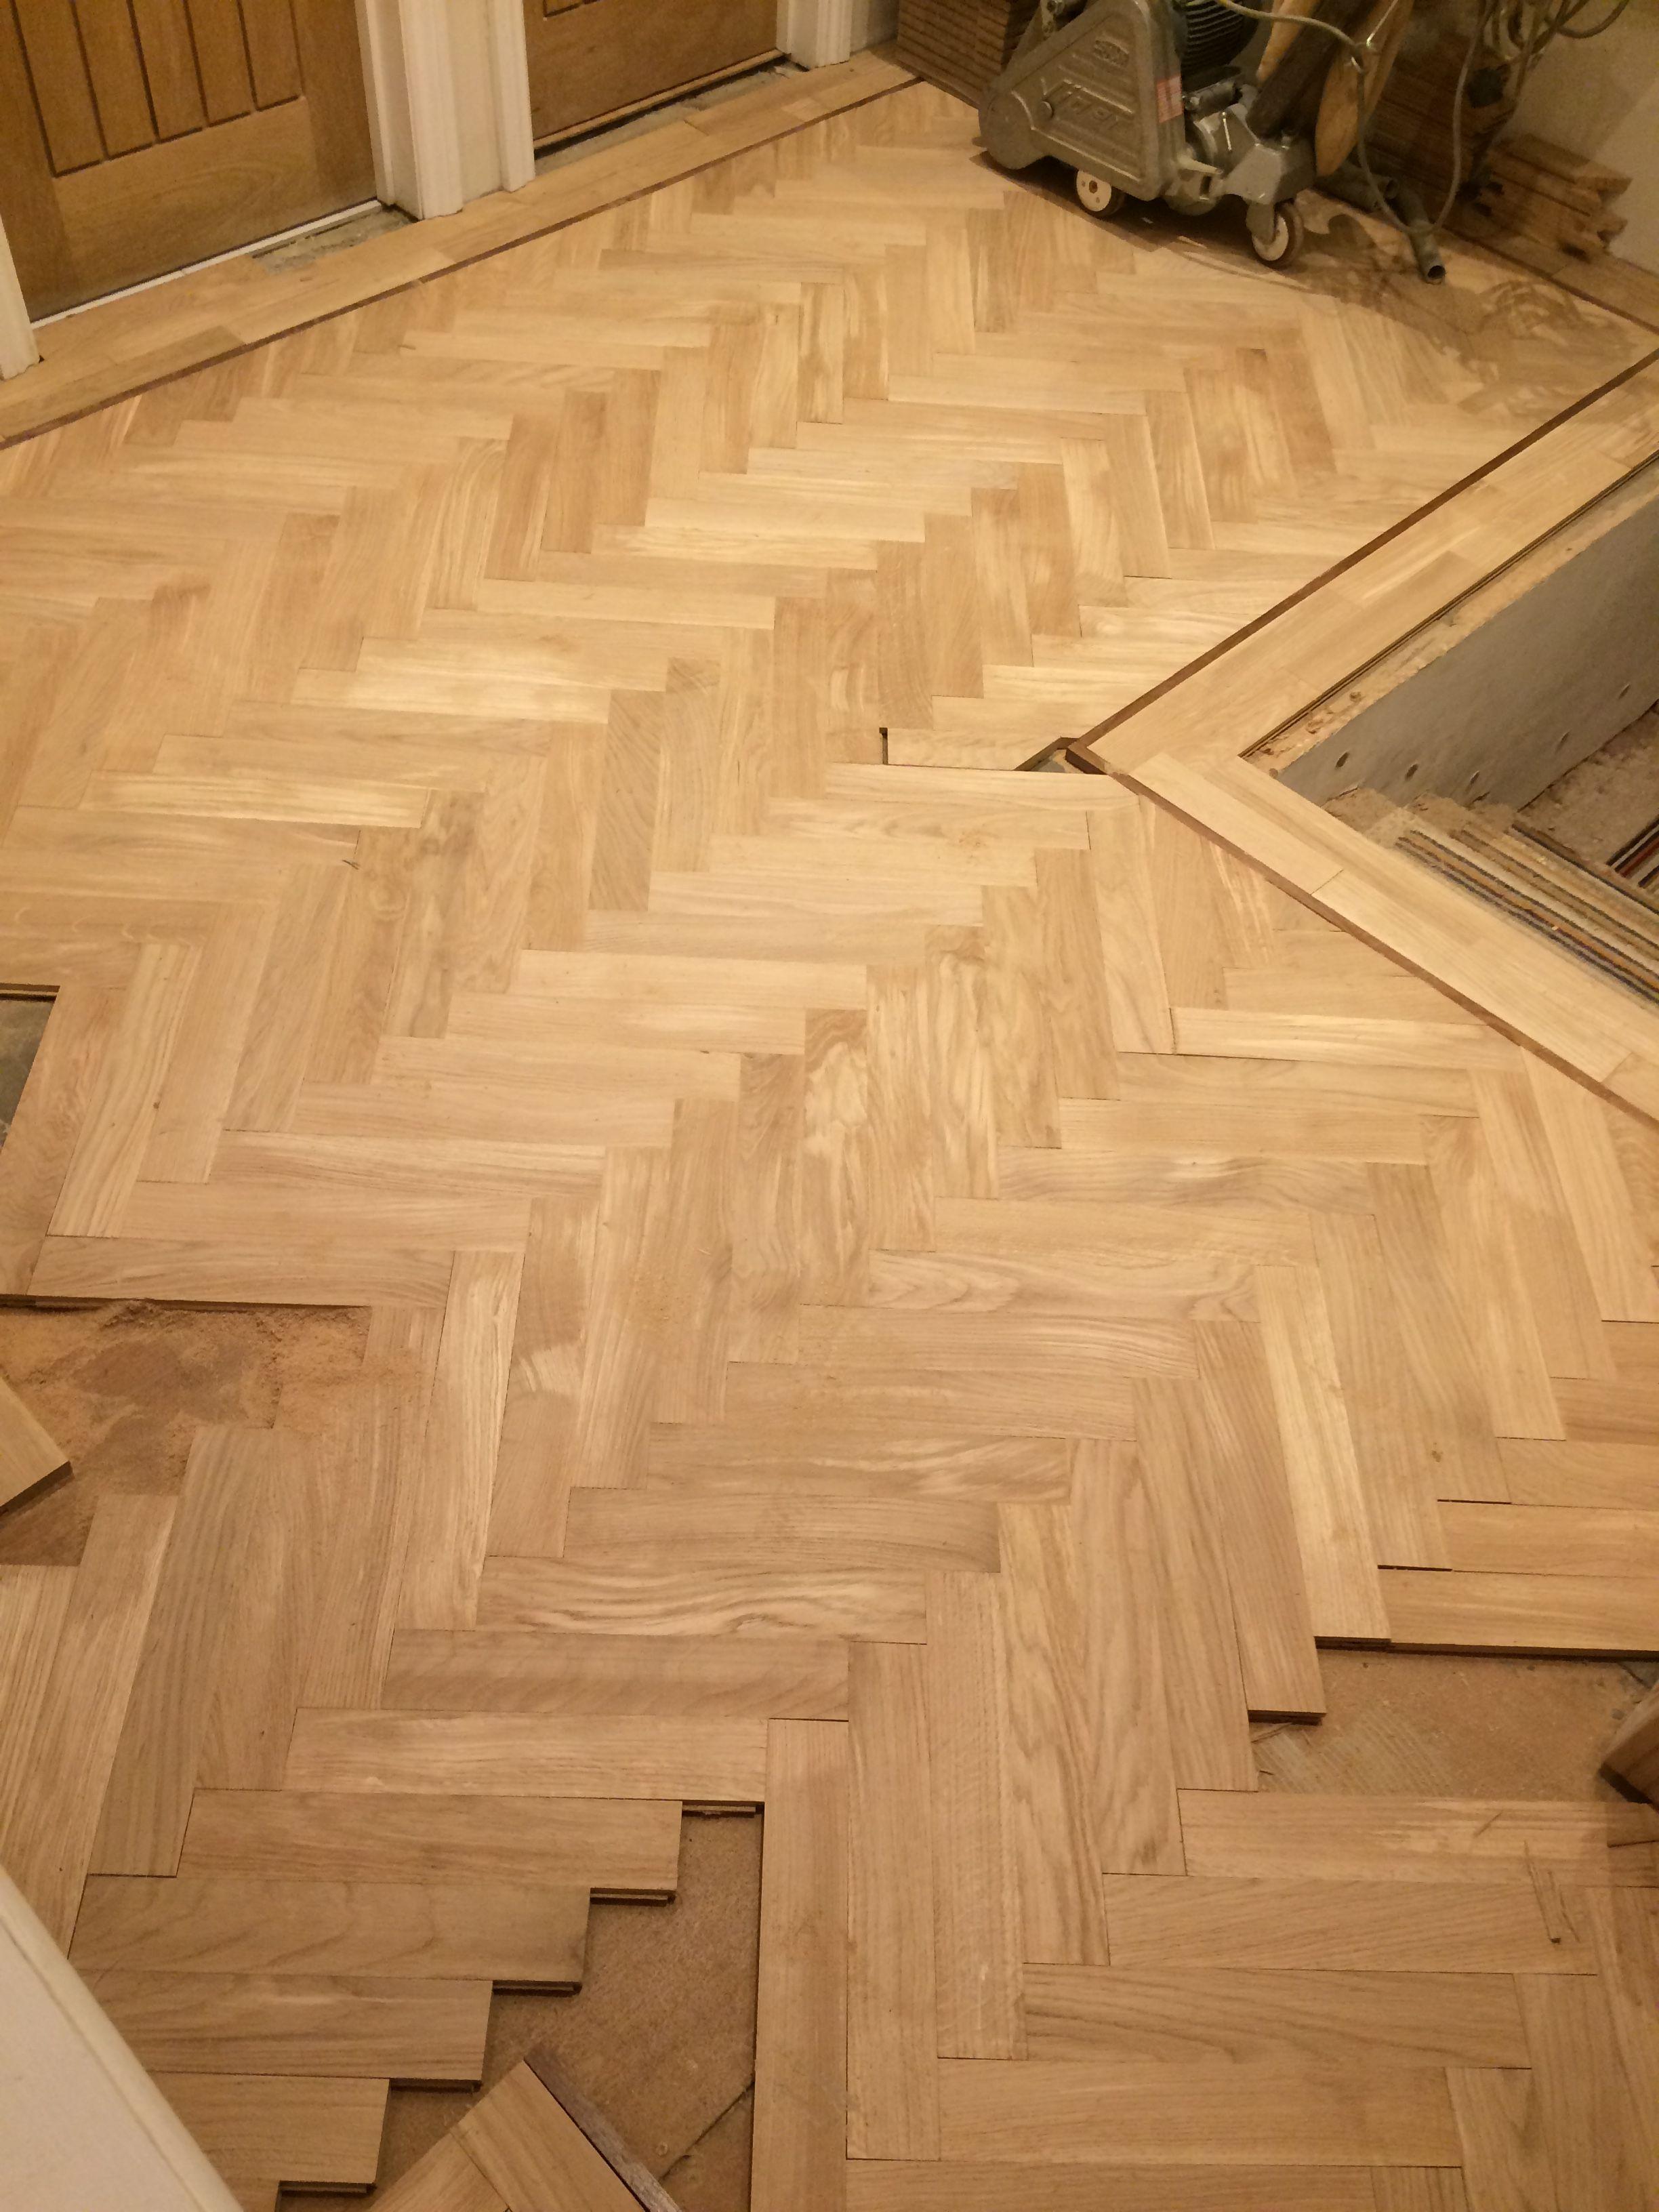 Prime Grade Oak Parquet Floor With A Walnut Tramline Being Laid In - Oak tree hardwood parquet flooring